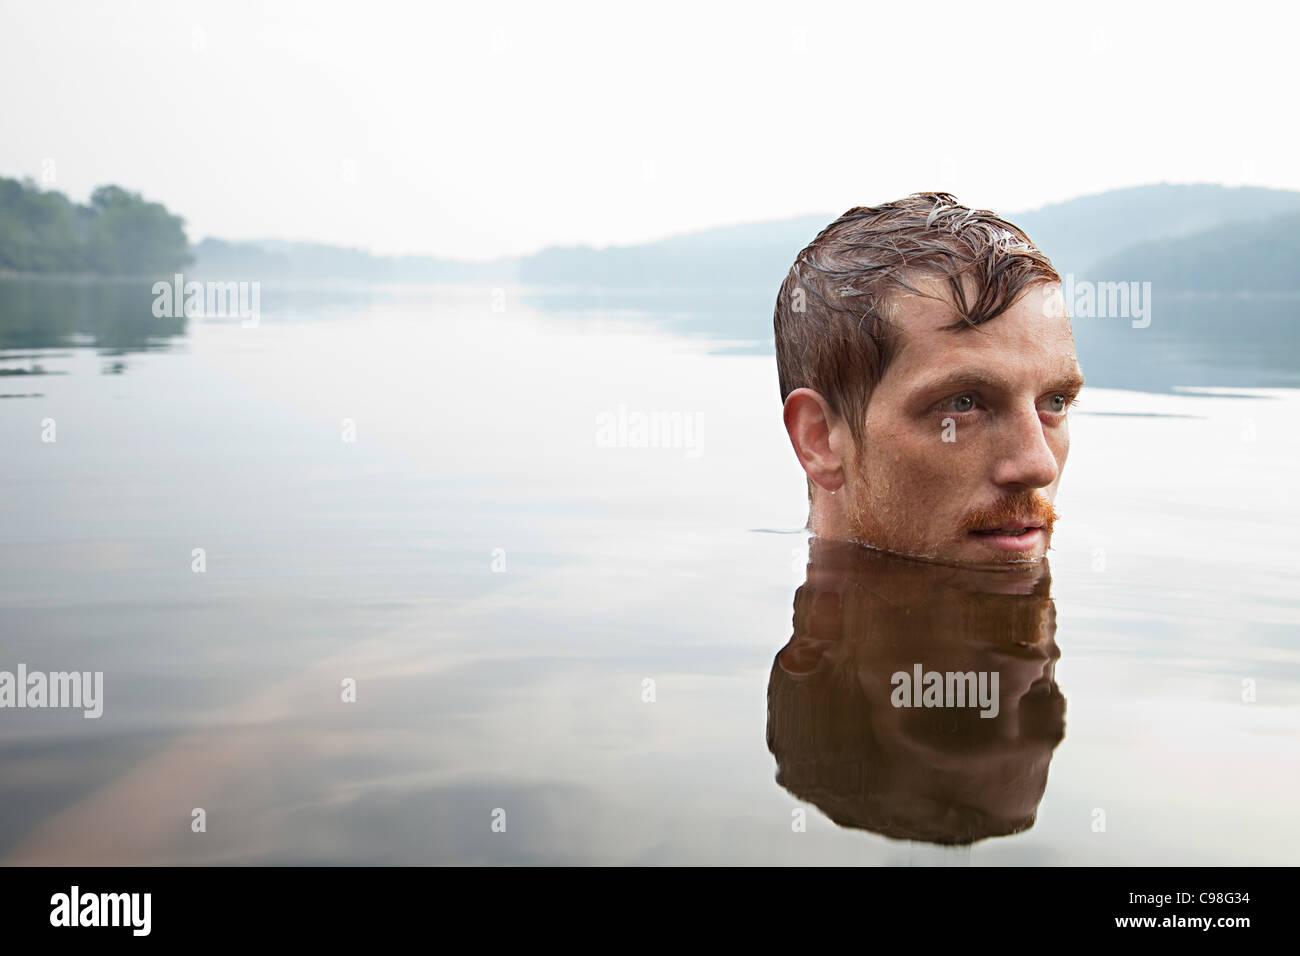 Hombre adulto medio lago natación Imagen De Stock